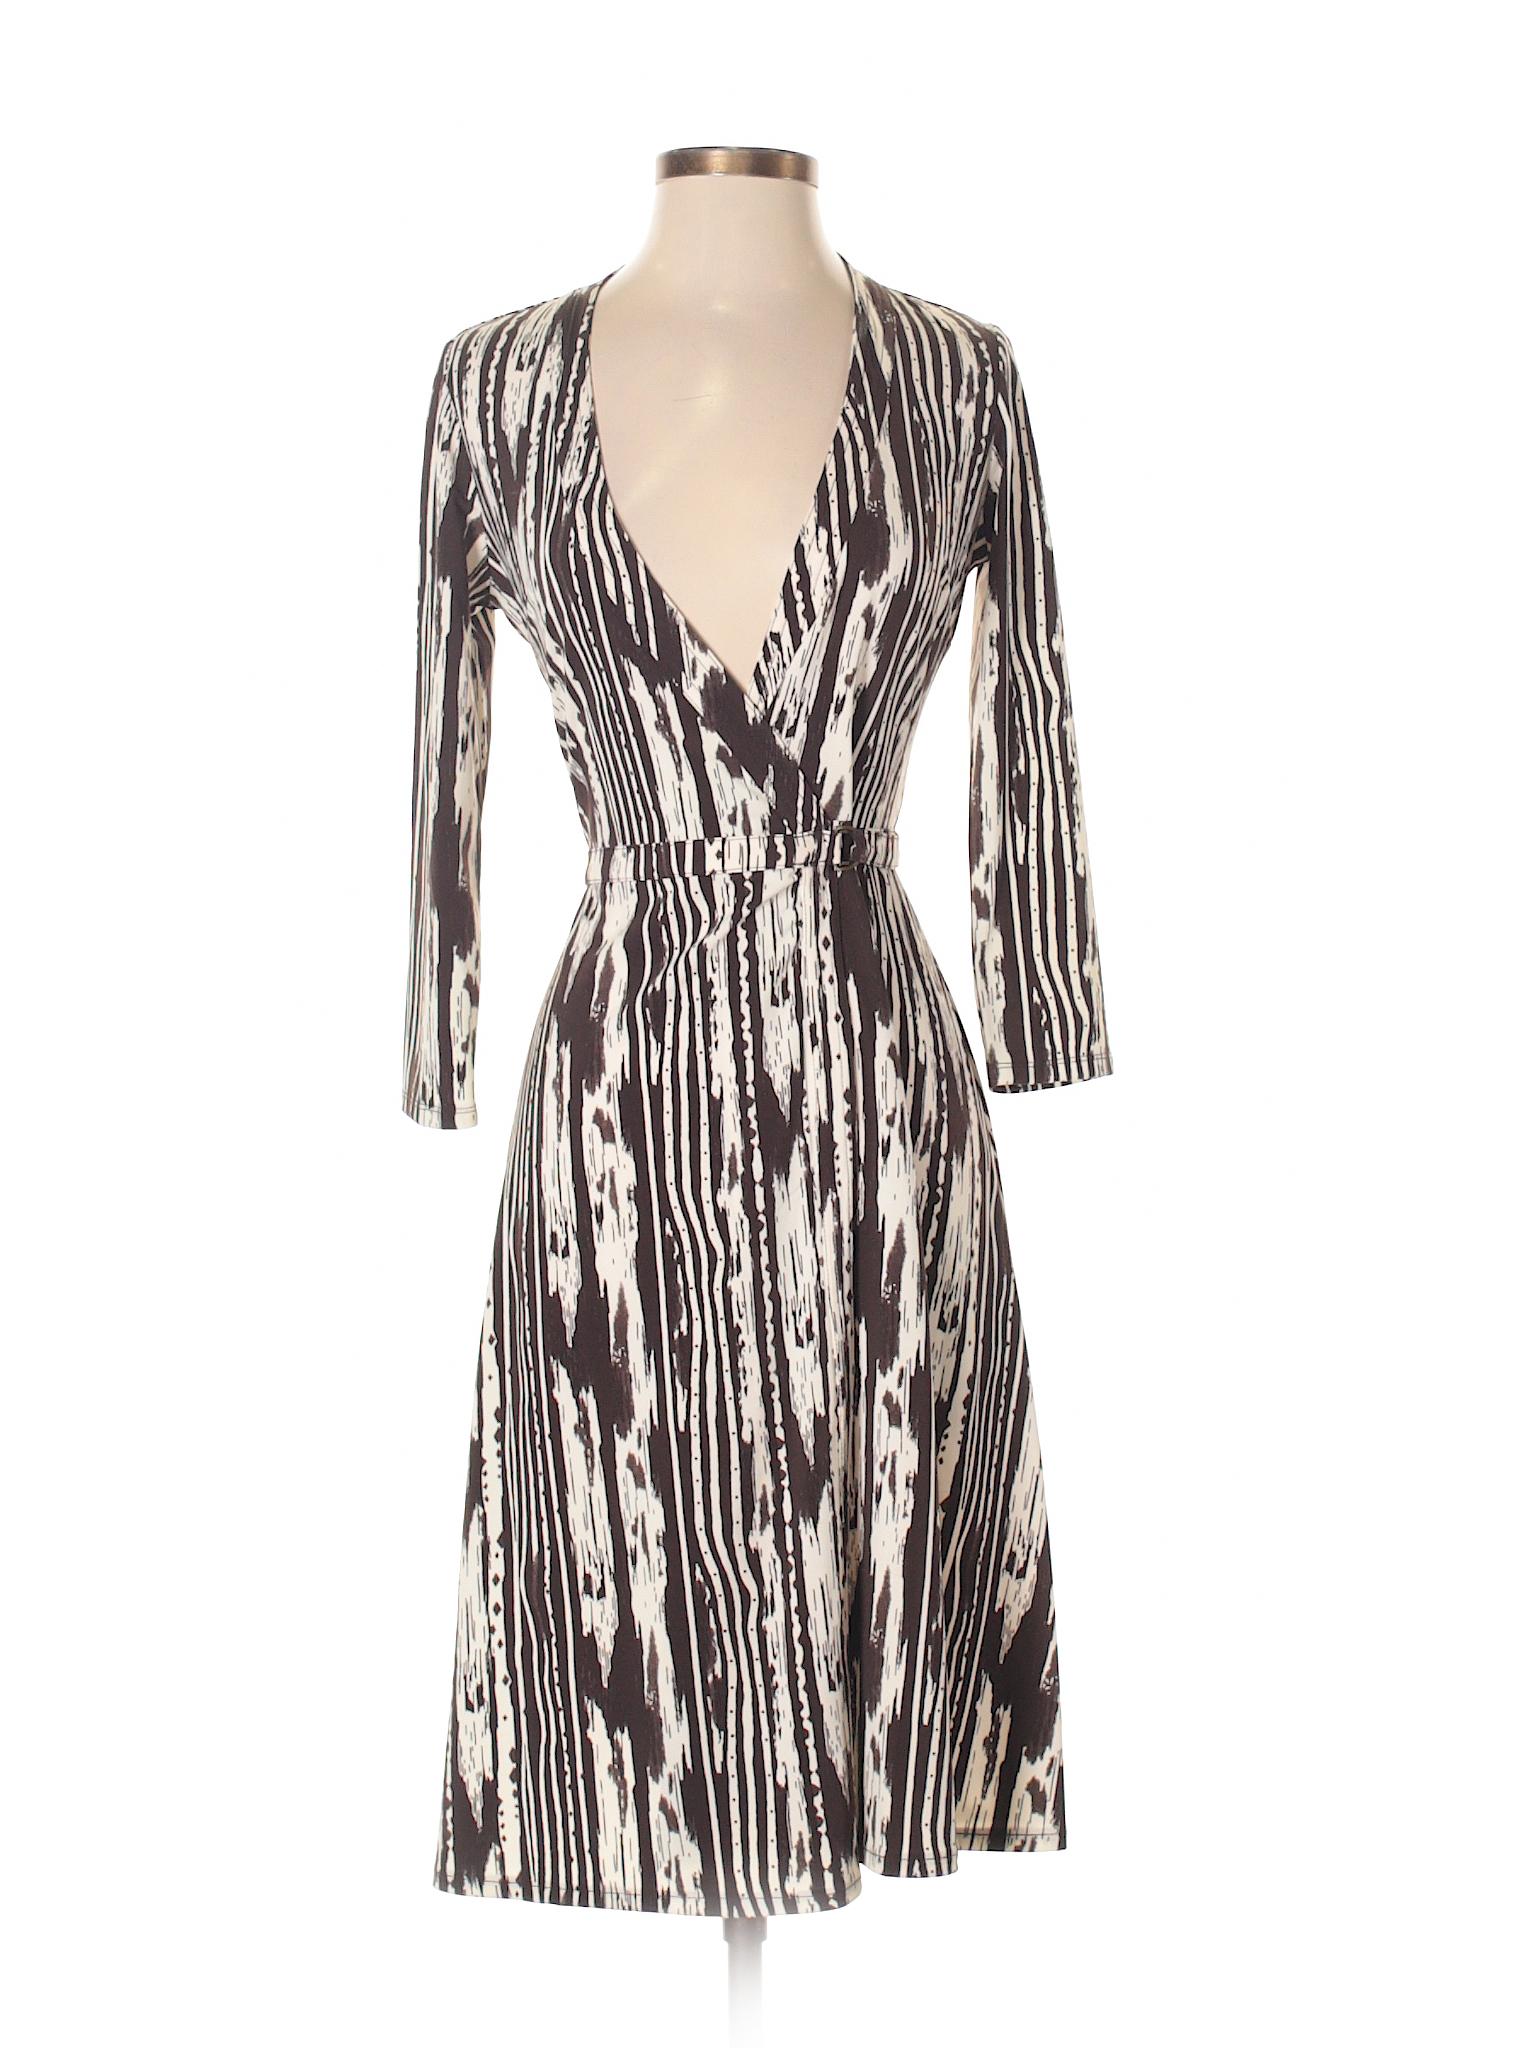 BCBGMAXAZRIA BCBGMAXAZRIA Casual Dress BCBGMAXAZRIA Boutique winter Casual winter Boutique Boutique Dress Casual Dress winter dHn5Yq